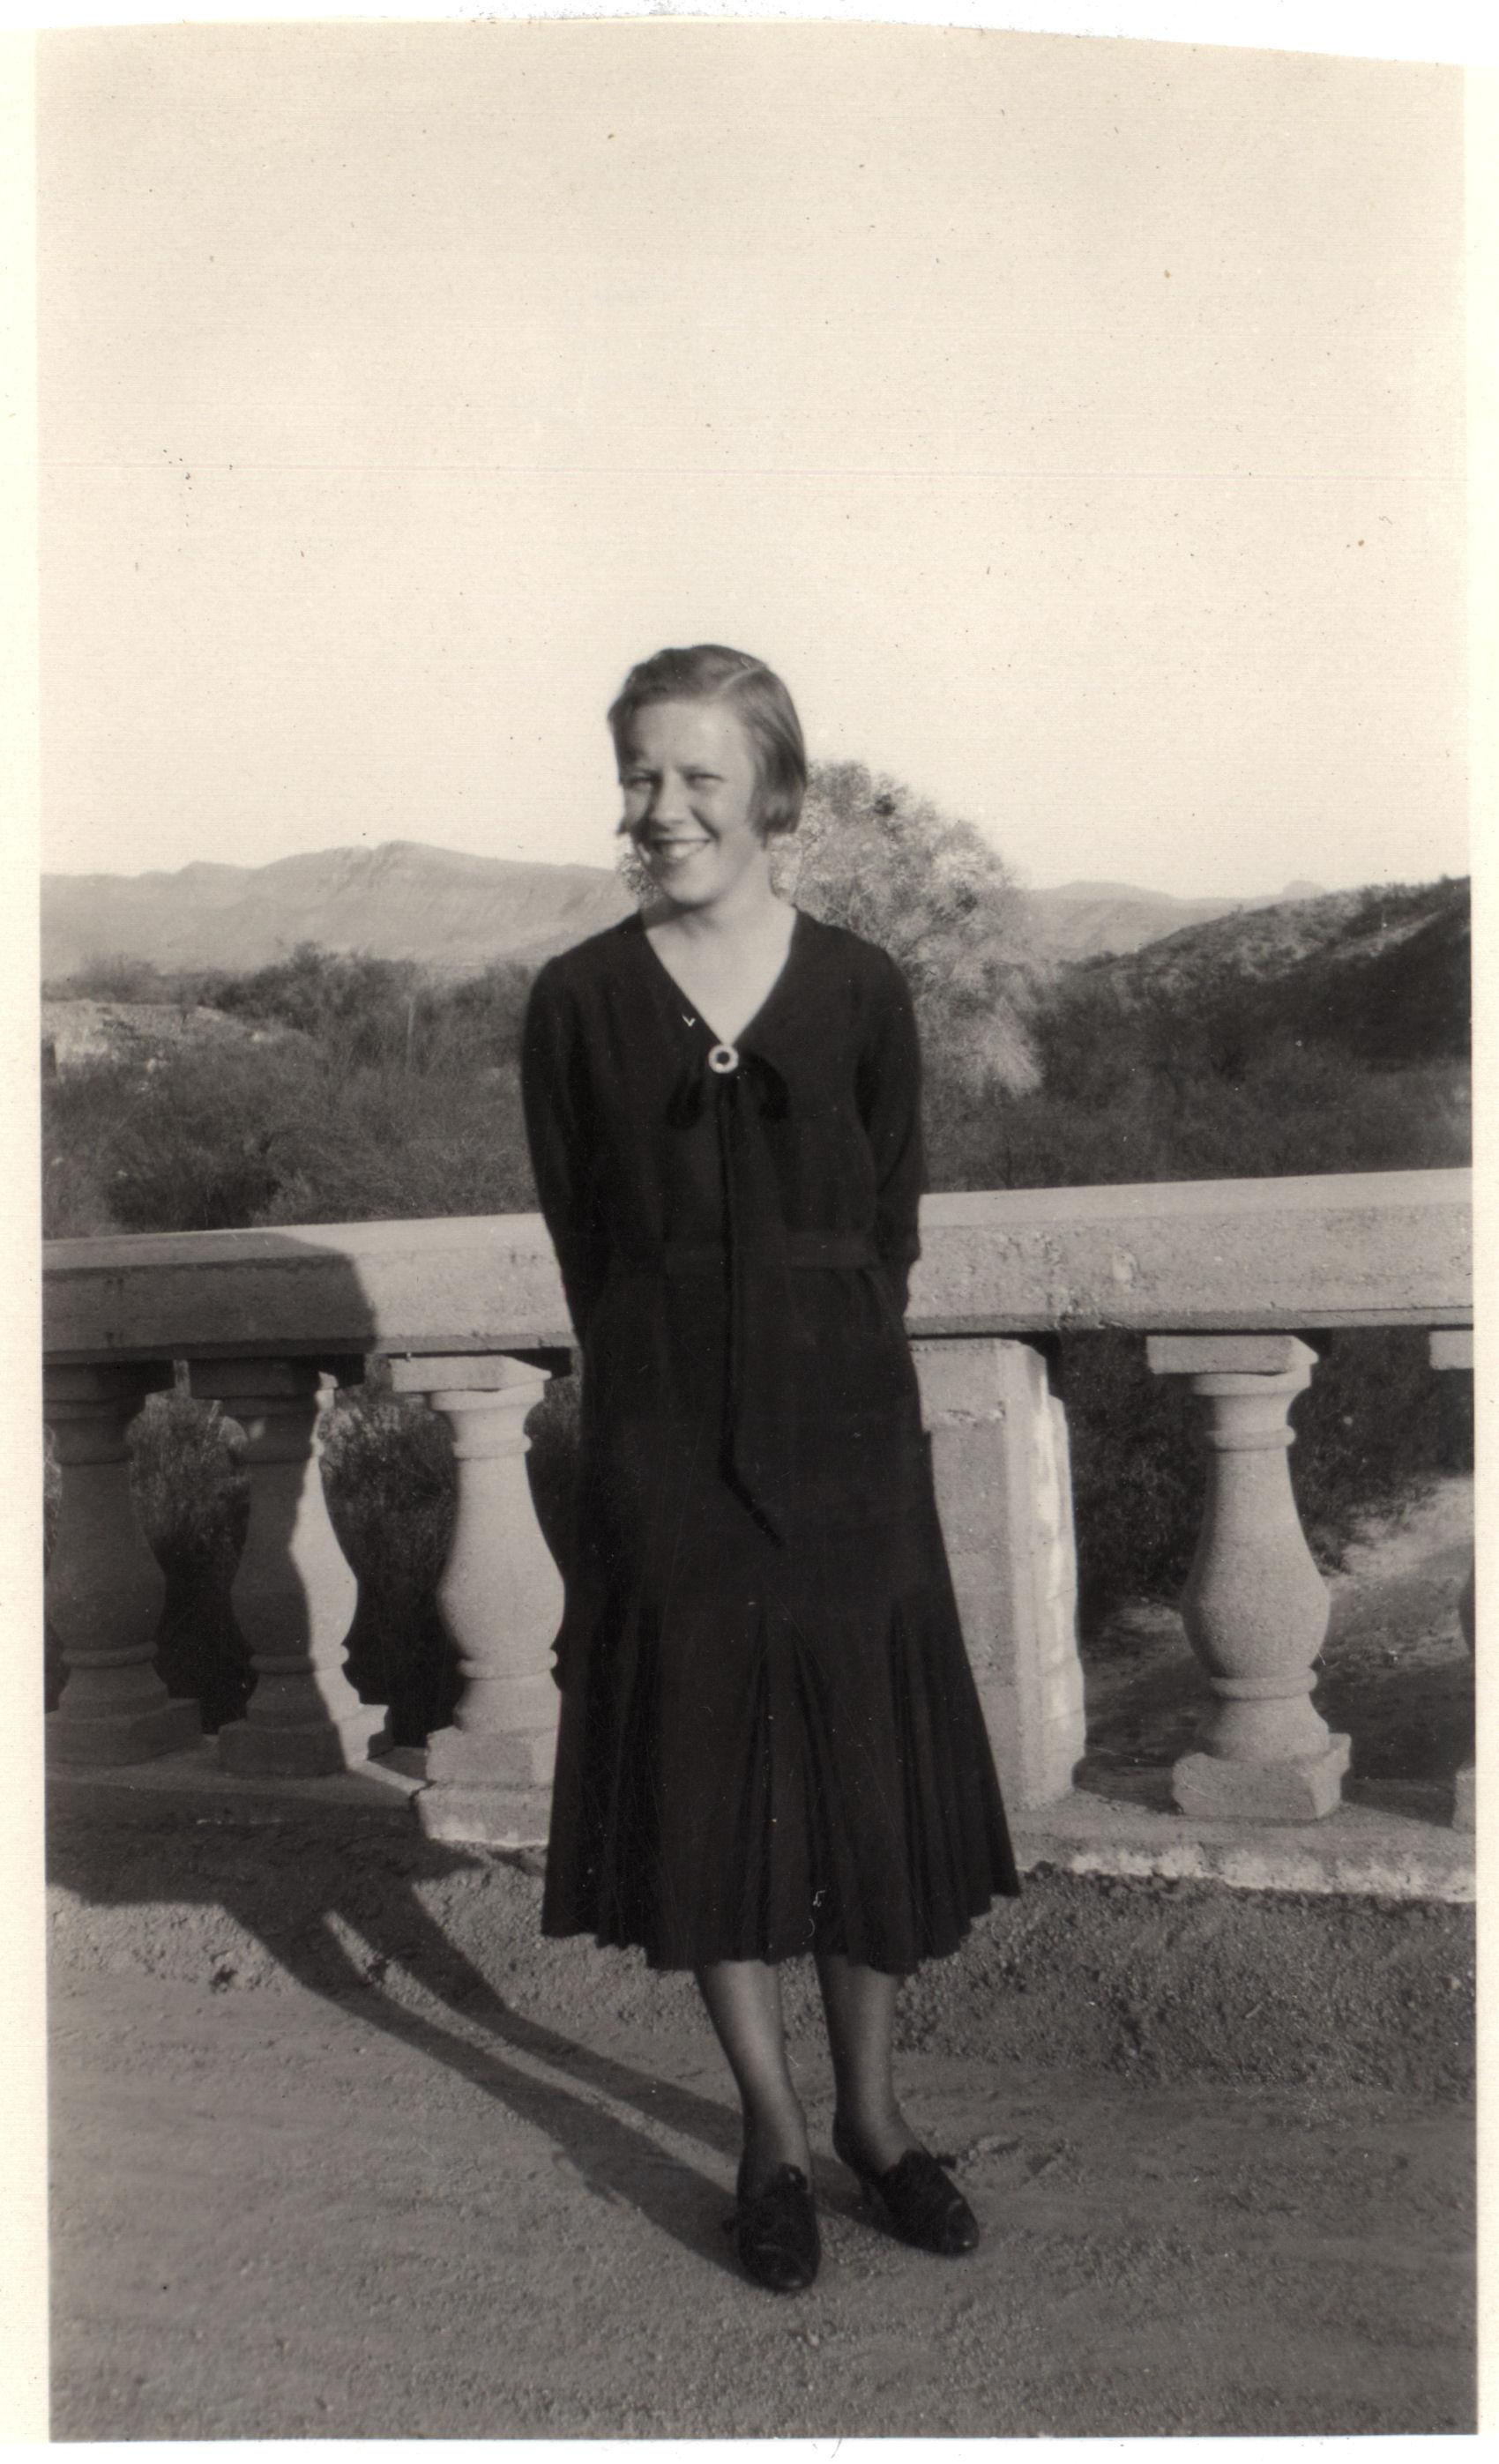 File:Girl in dress, early 1930s.jpg - Wikimedia Commons